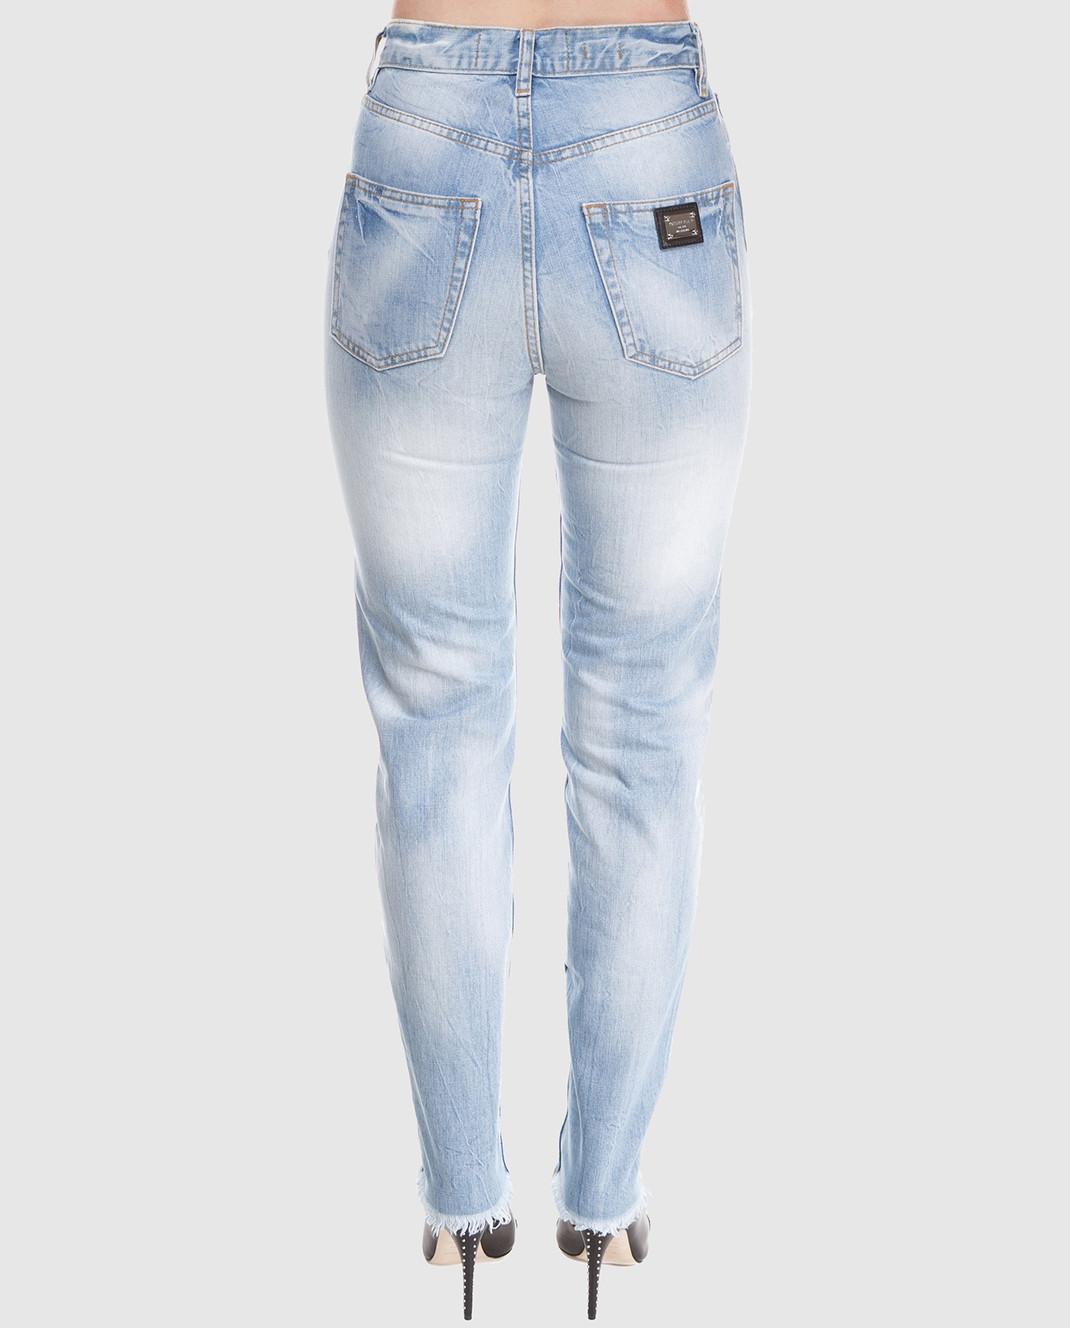 Philipp Plein Голубые джинсы изображение 4